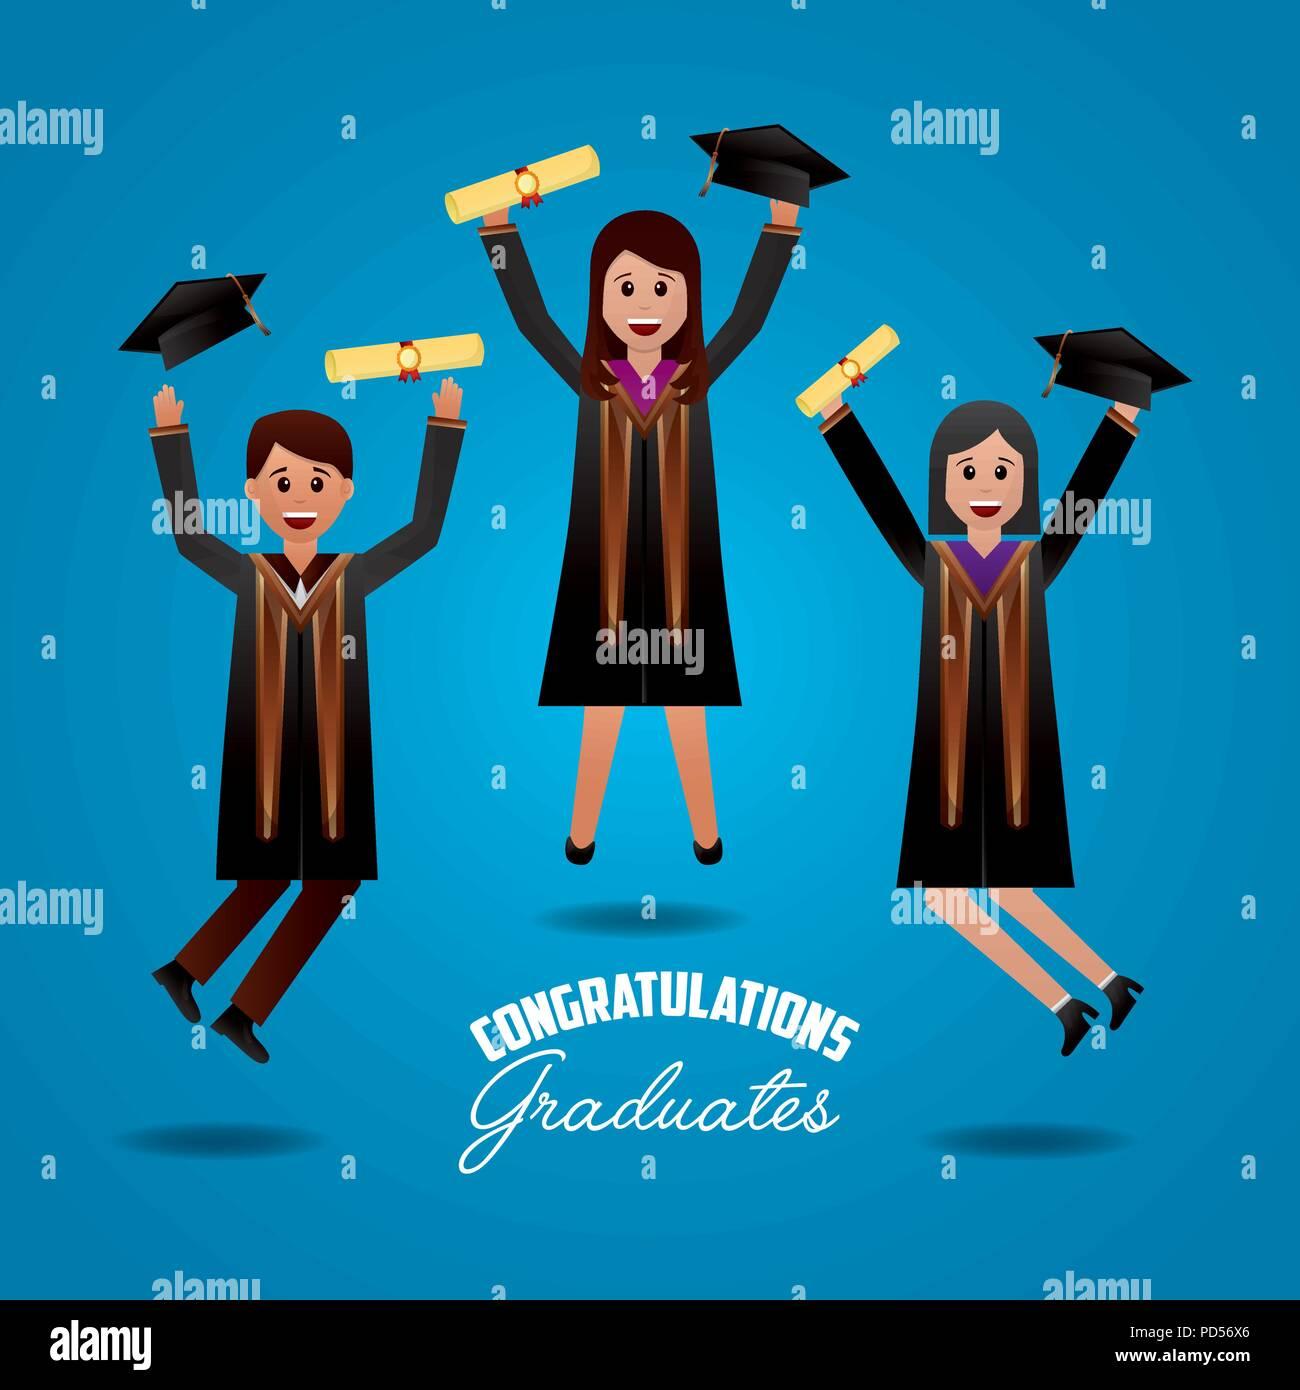 Congratulations Graduation Card Stock Vector Art Illustration